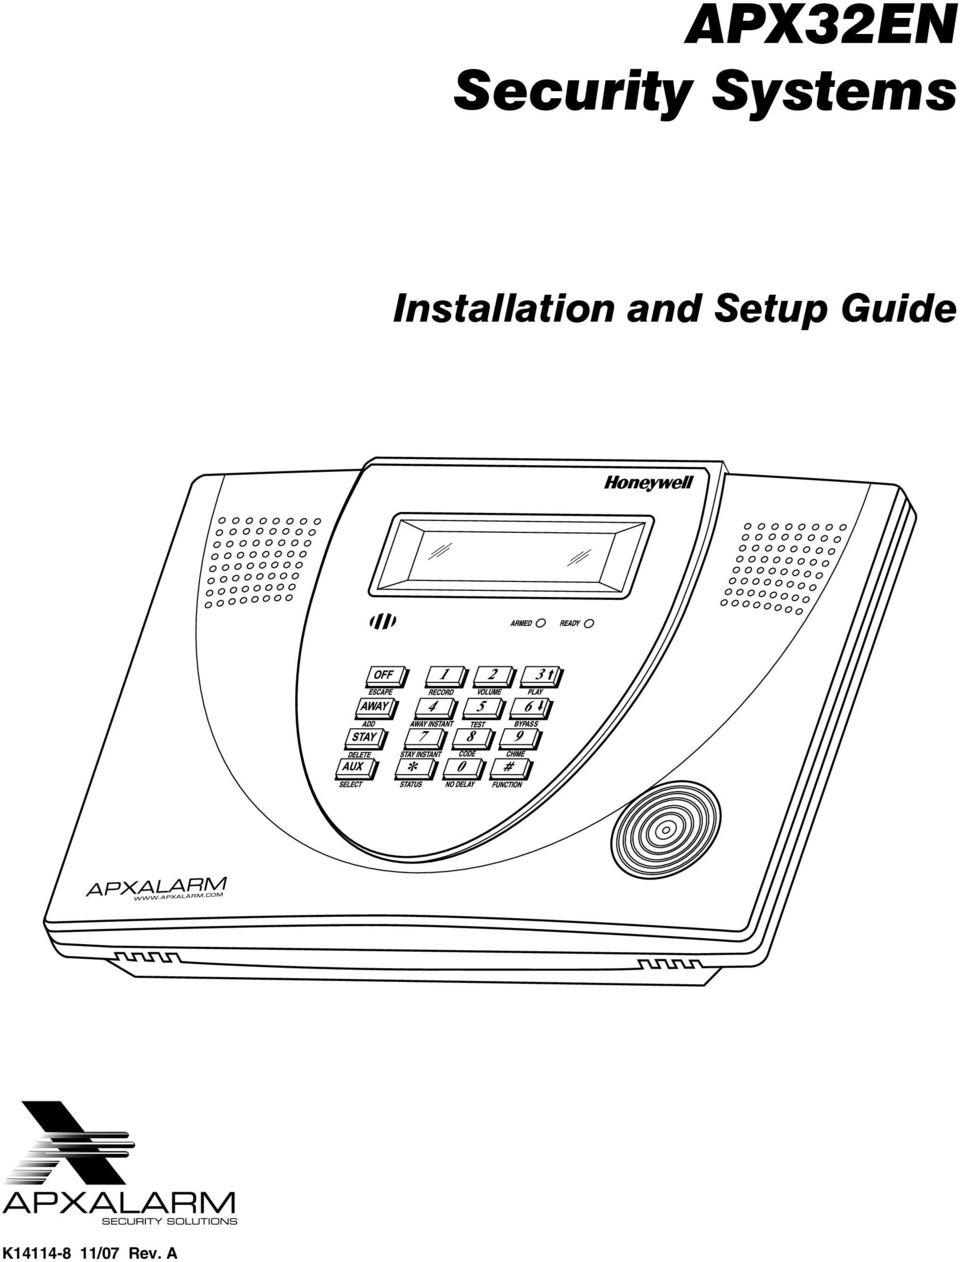 medium resolution of installation and